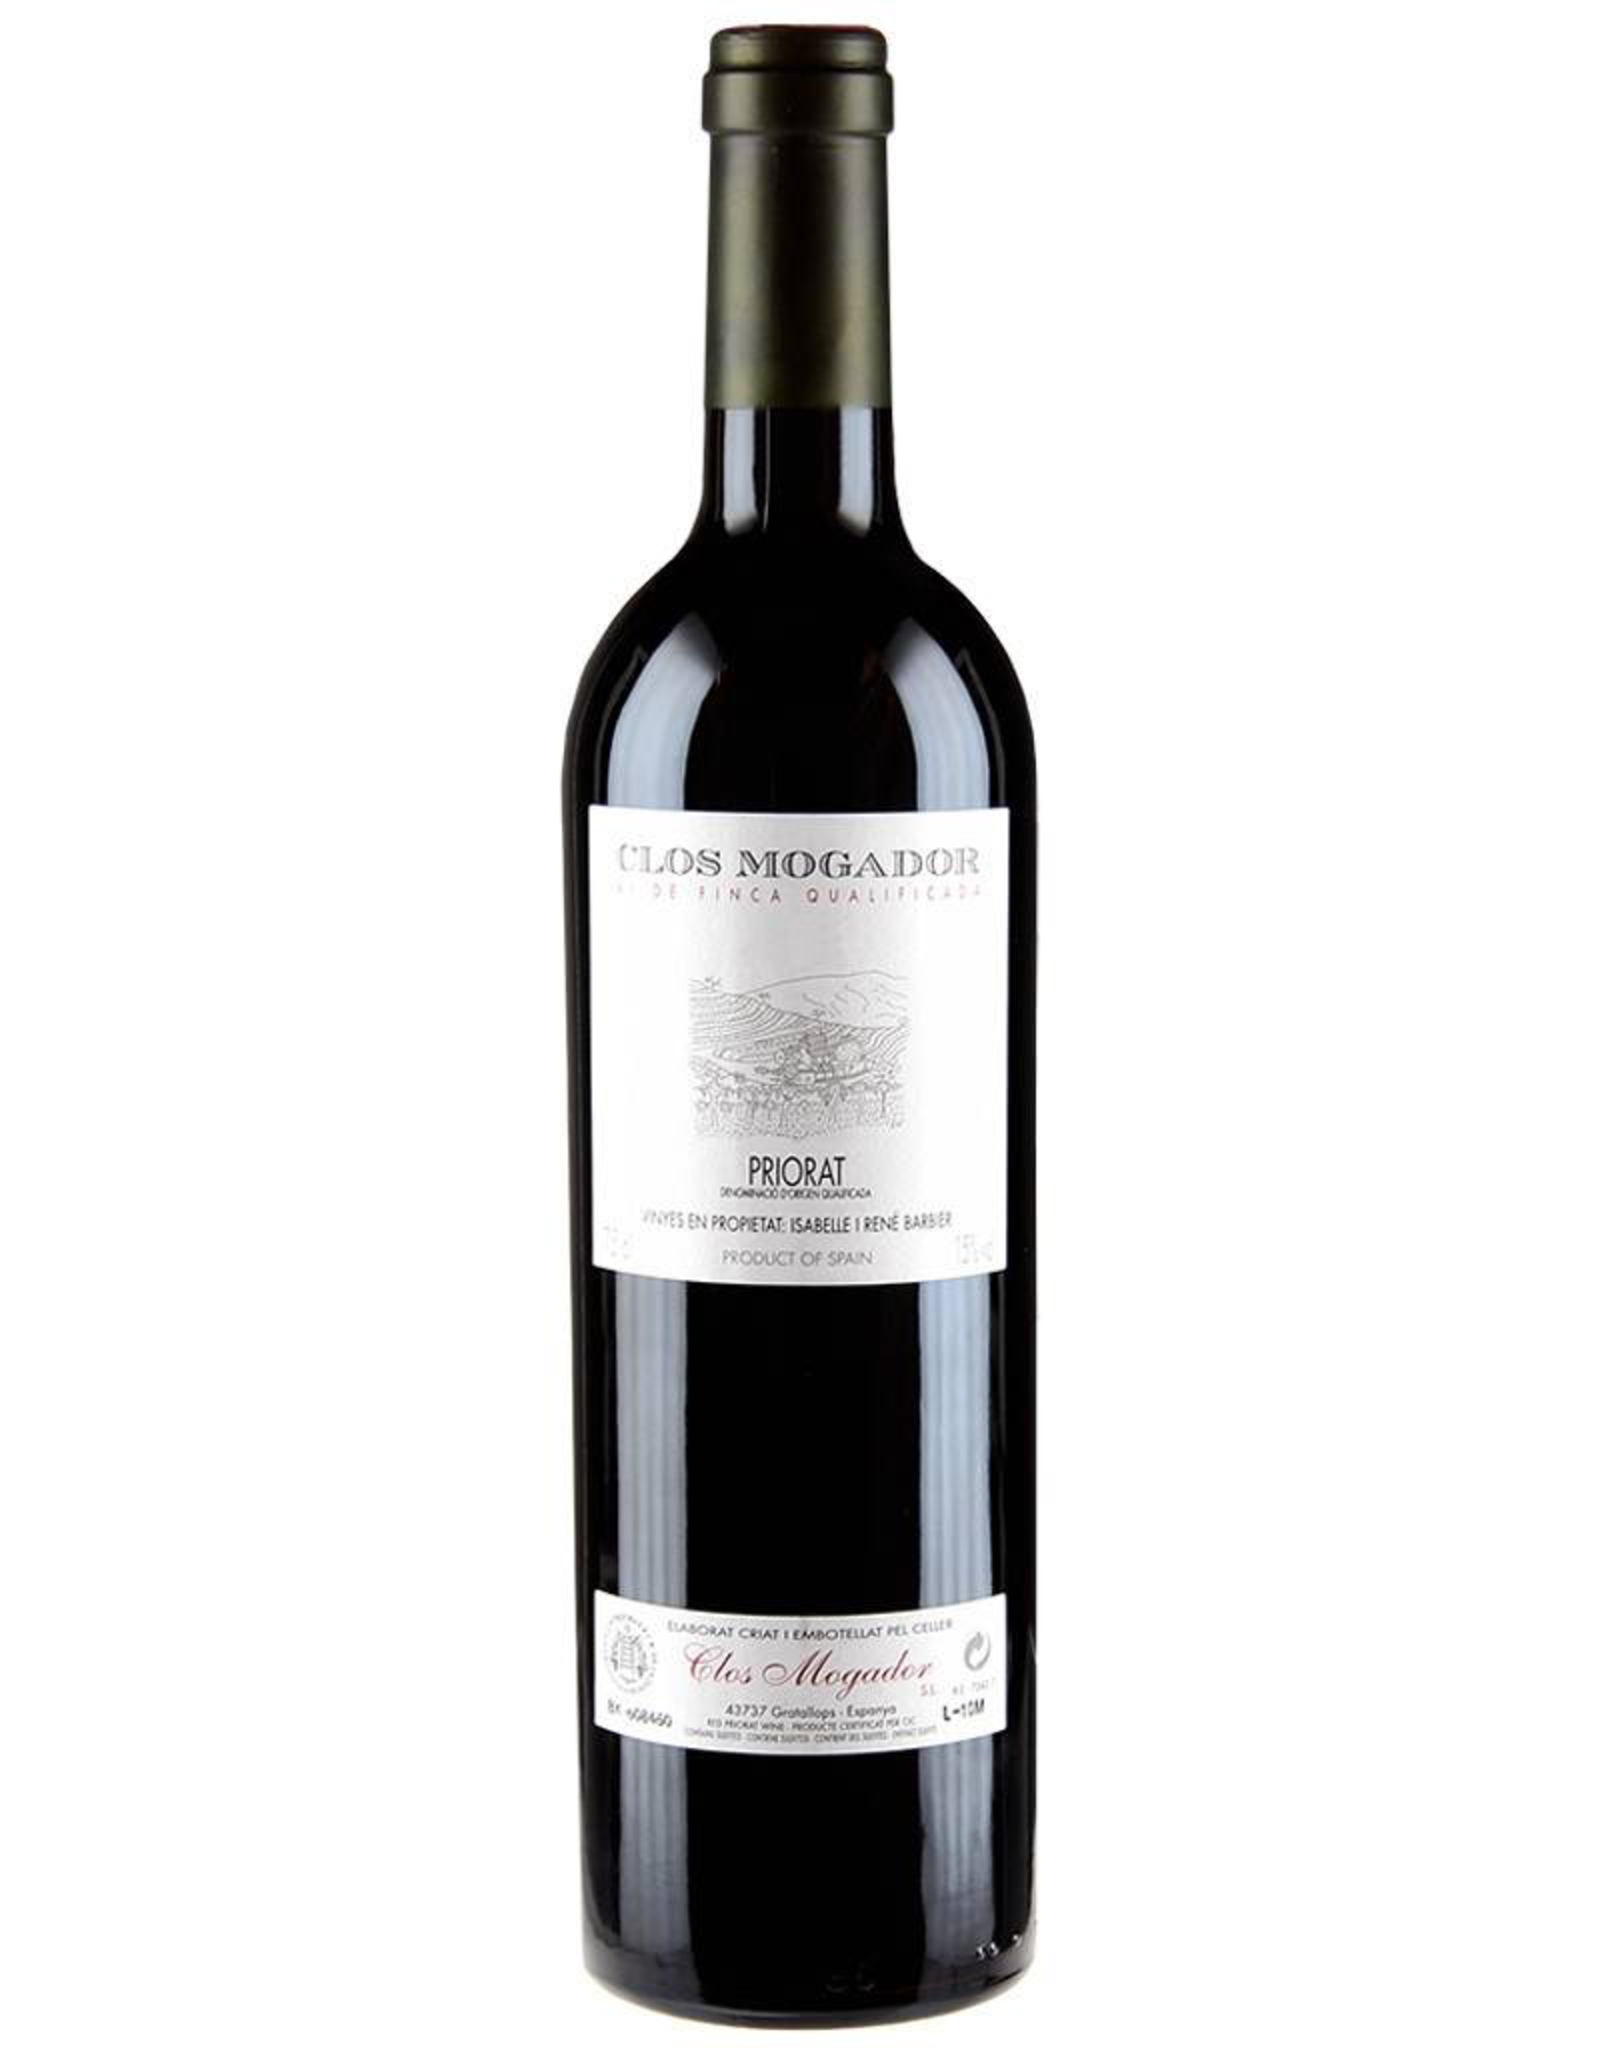 Red Wine 2016, Clos Mogador, Grenache Blend, Priorat,  Catalunya, Spain, 15.0% Alc, CTnr RP98